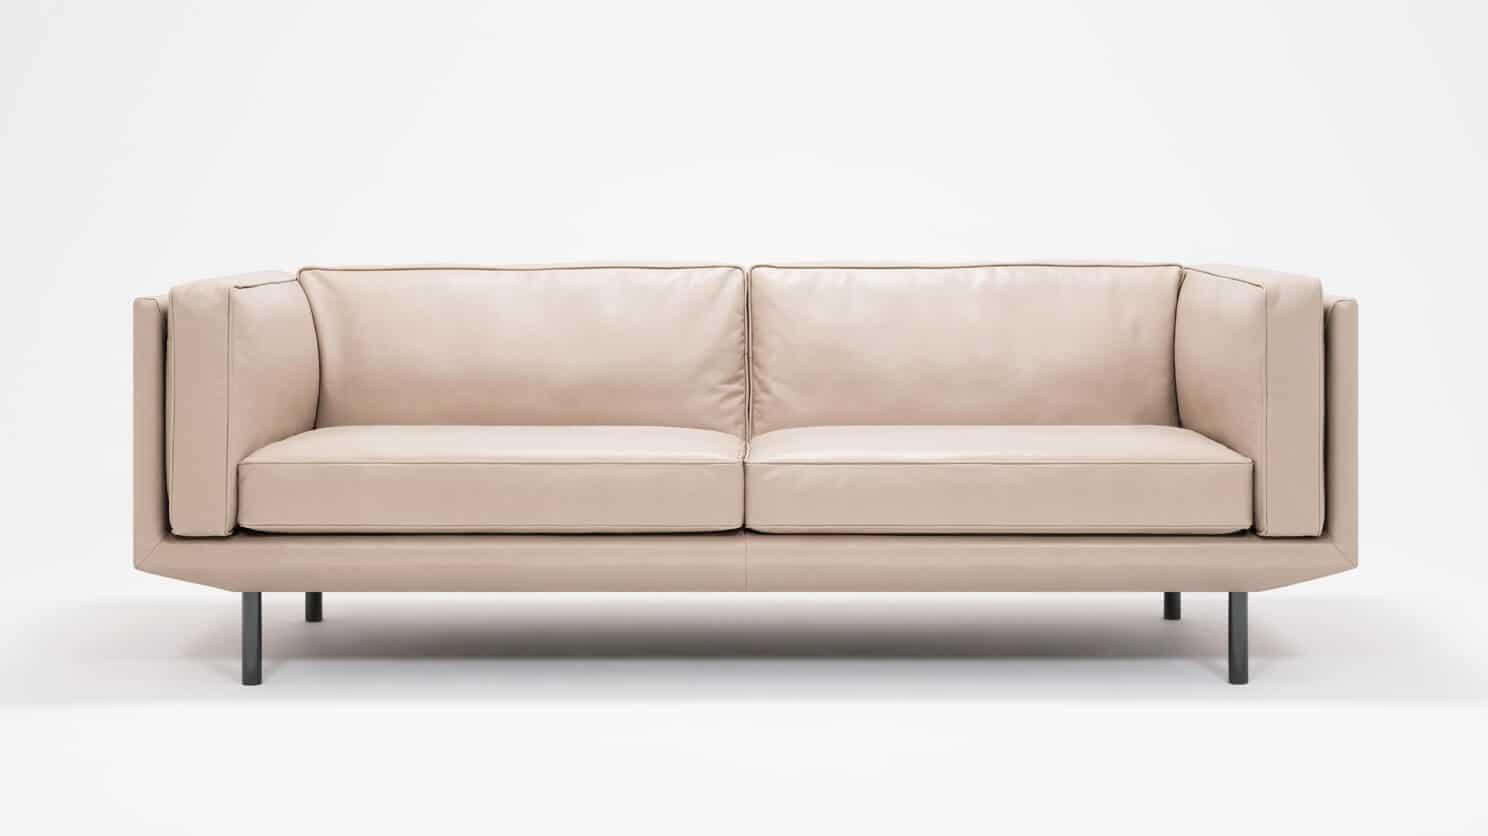 37154 01 01 sofa plateau 84 feather coachella warm grey front view